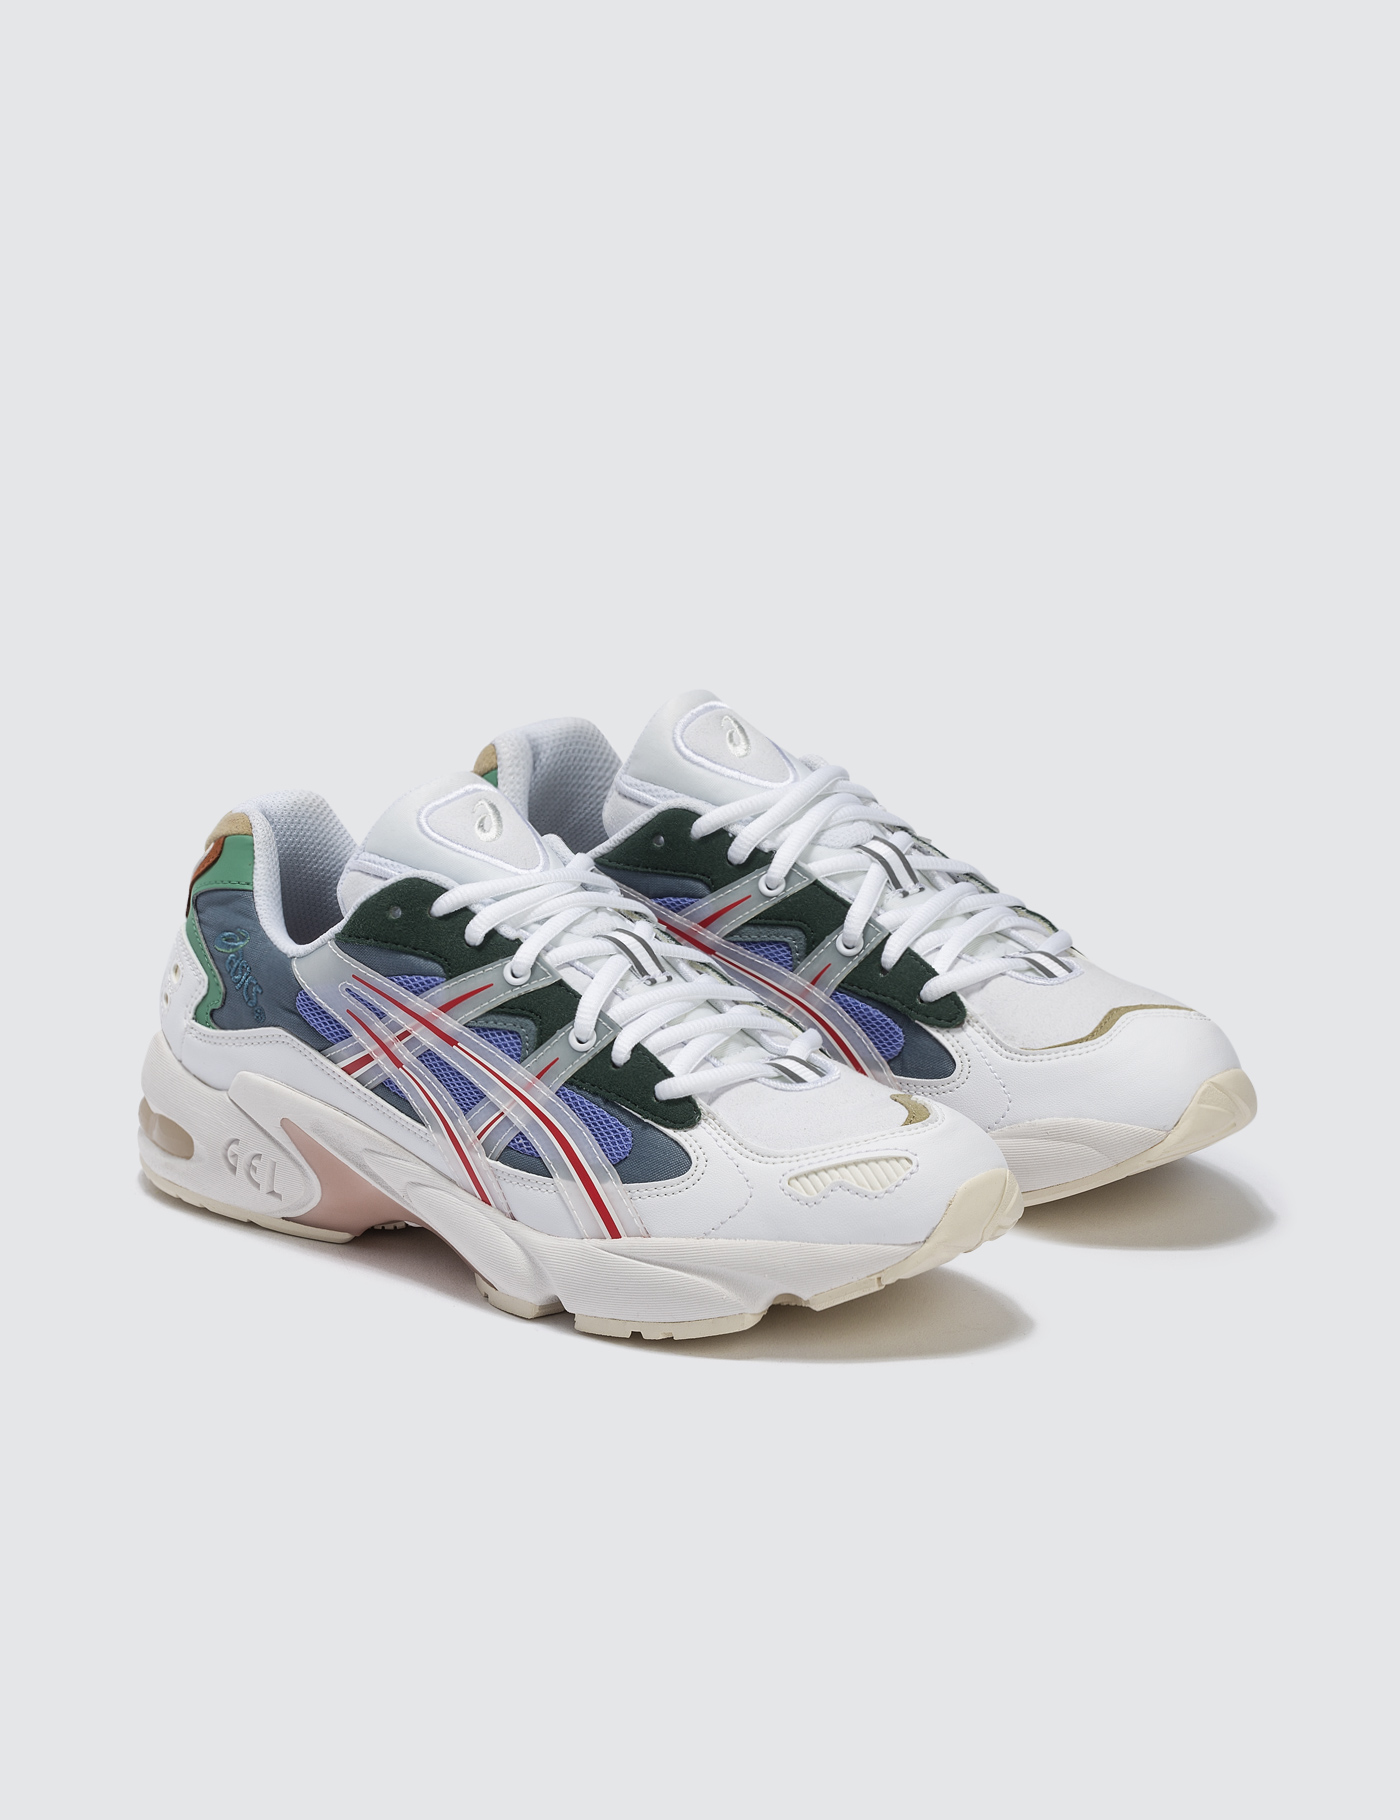 Shoes_1_9.jpg